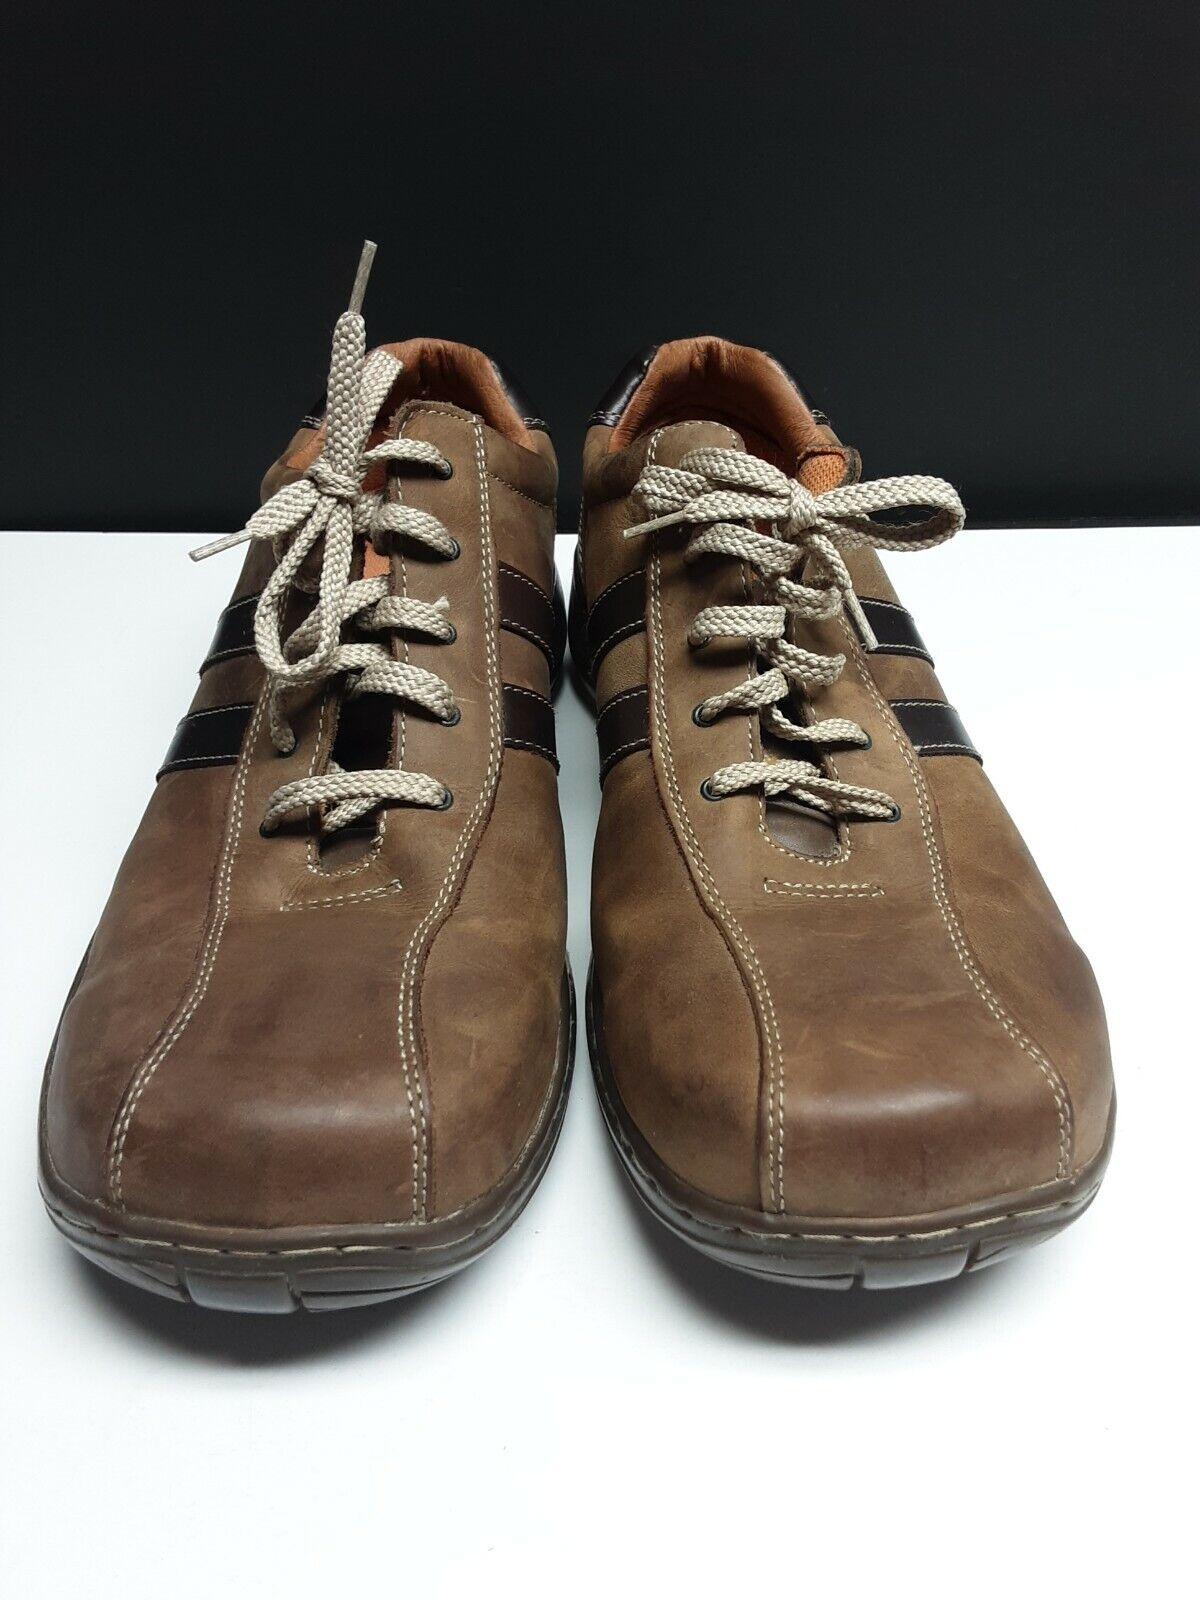 SKECHERS 4400 Mens 13 Extra Wide Brown